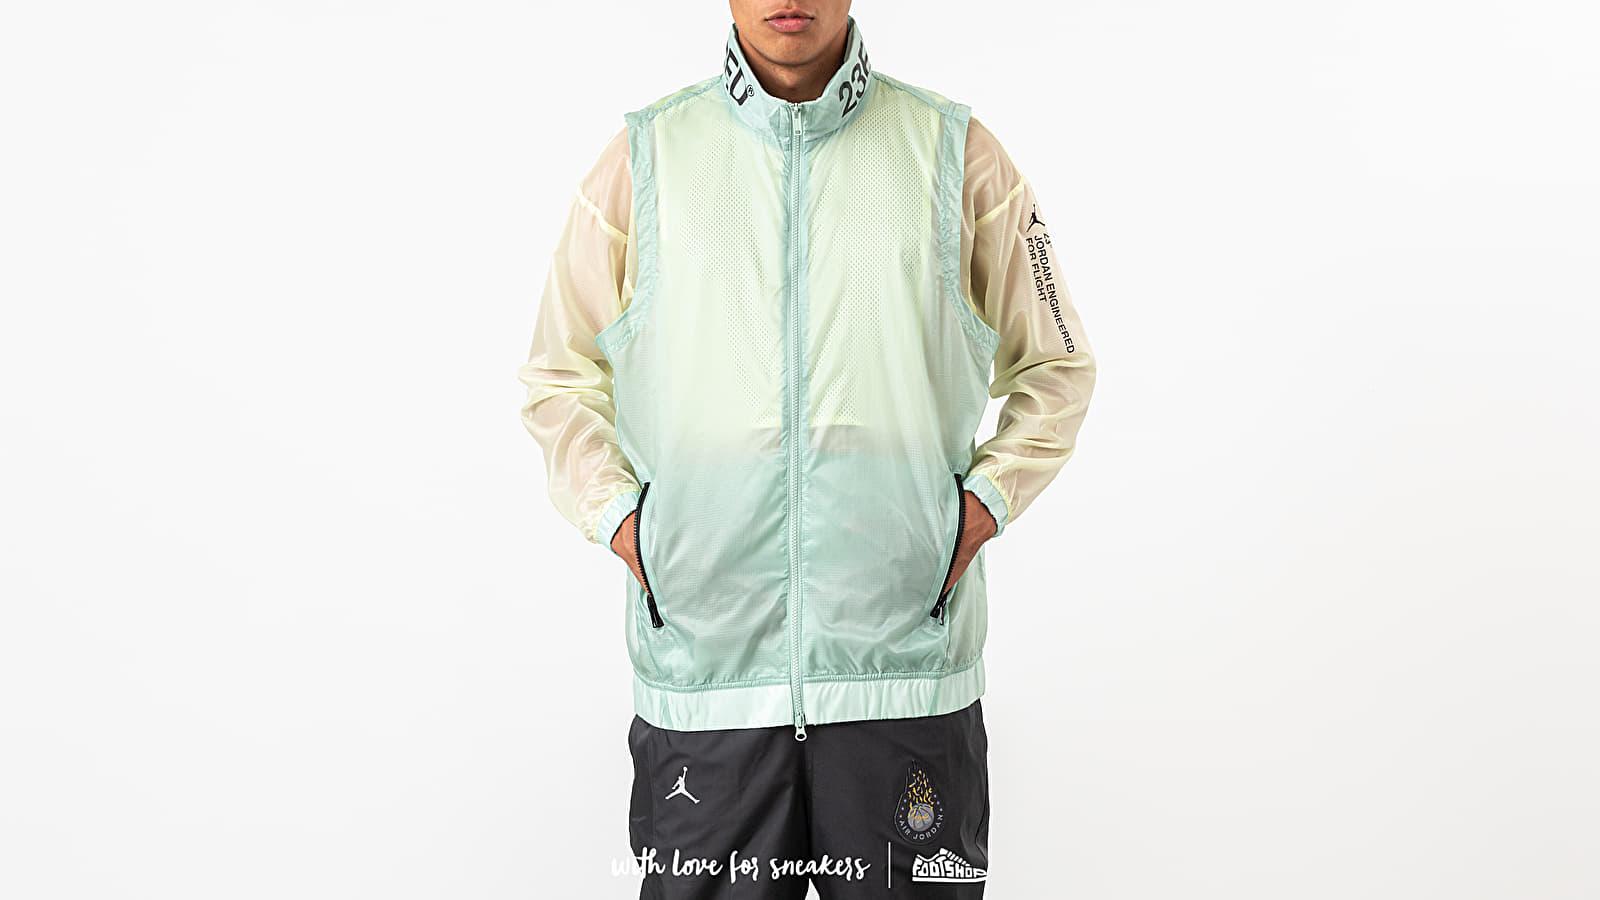 Jordan 23 Engineered Jacket